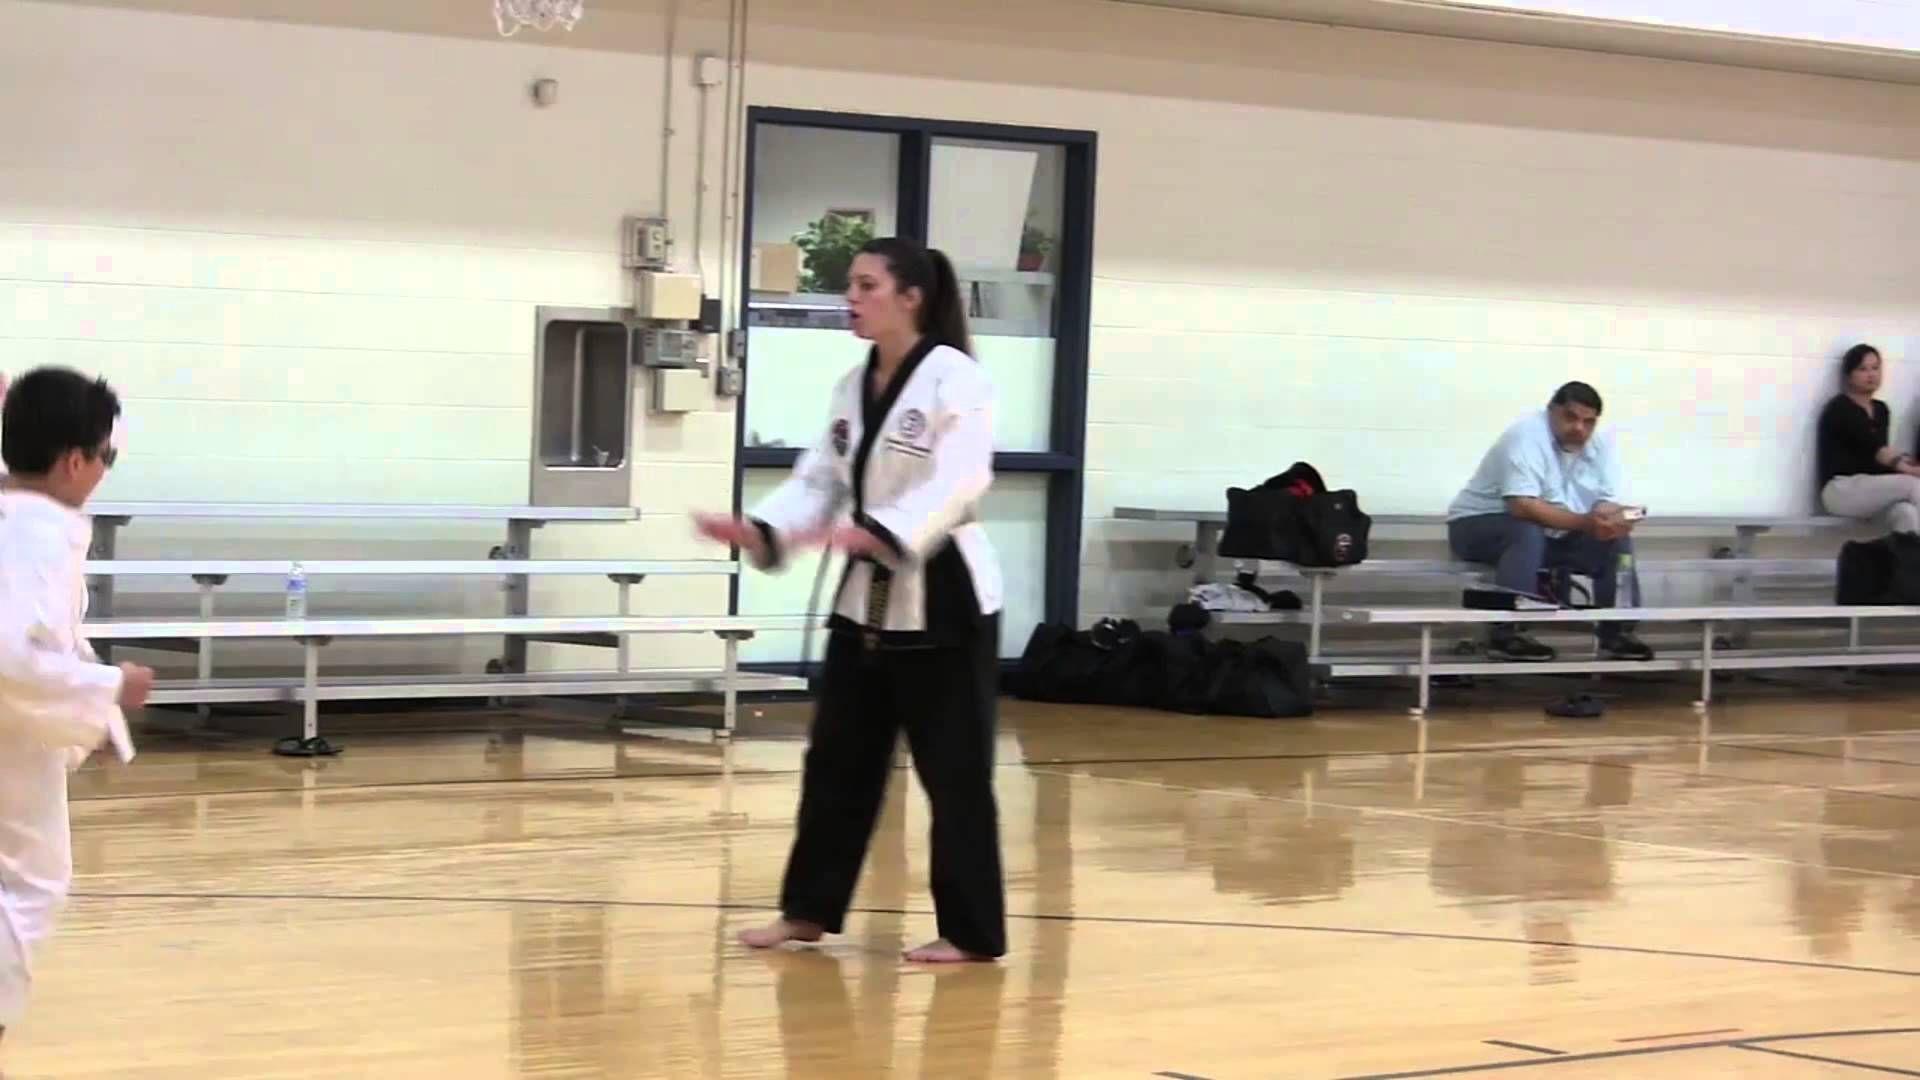 Meet David & Elizabeth Rossiaky, martial arts instructors